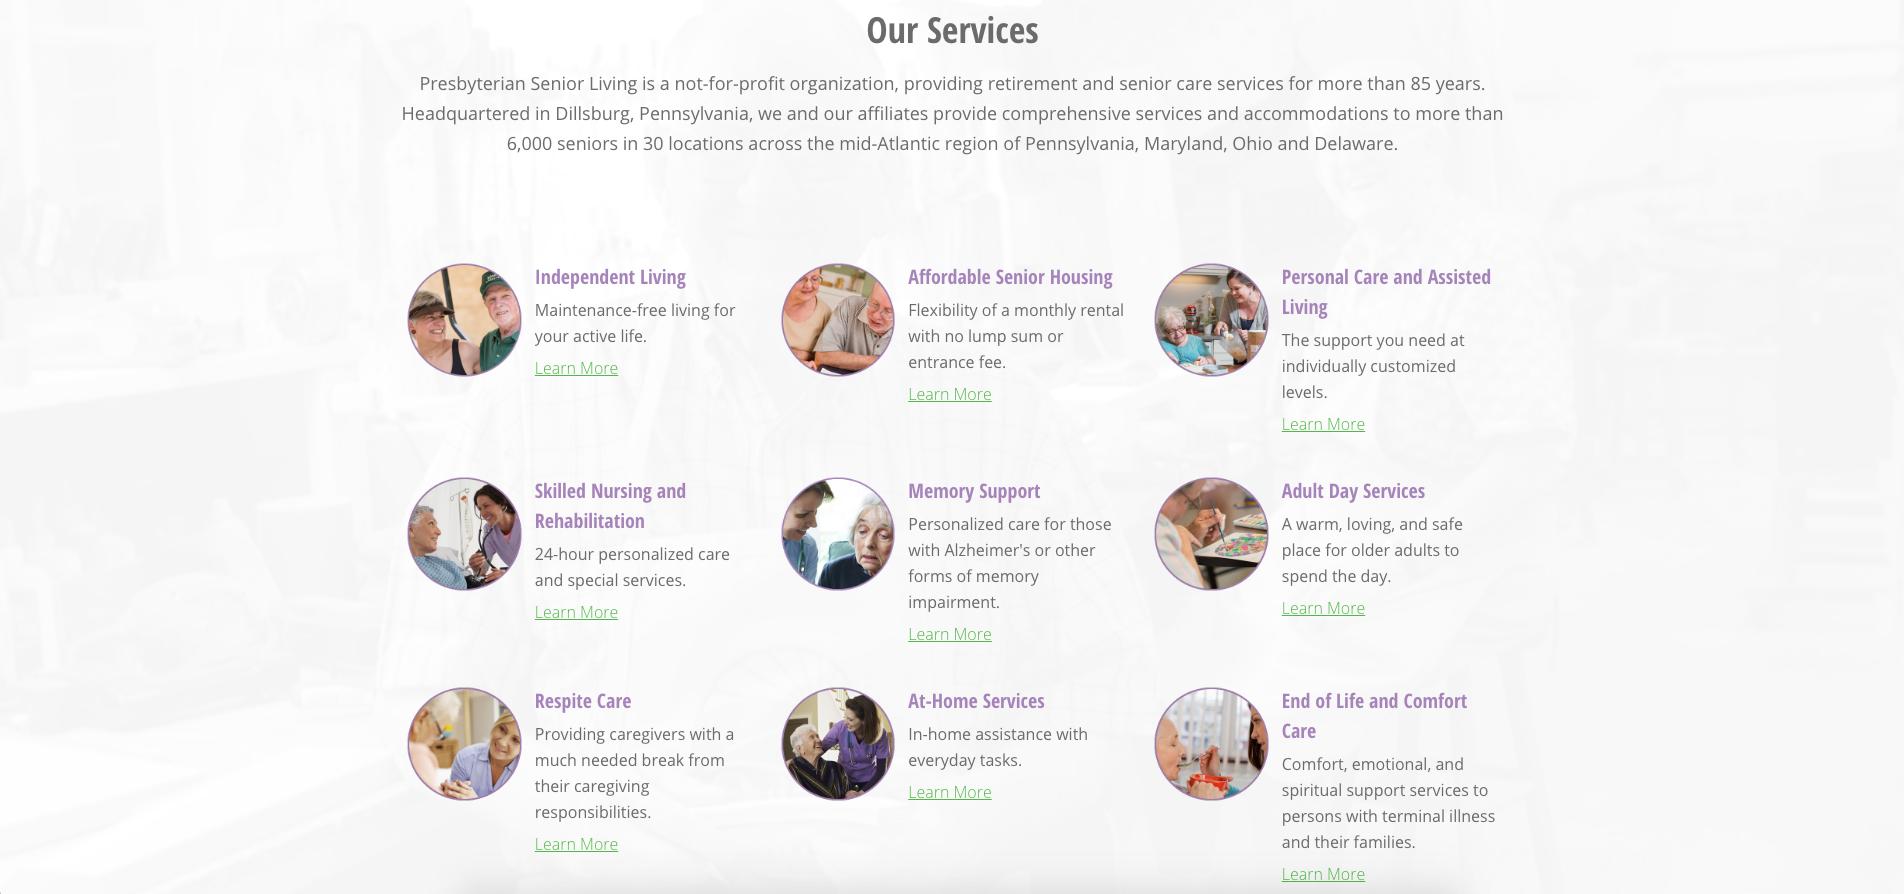 anasayfa-elementler-services.png